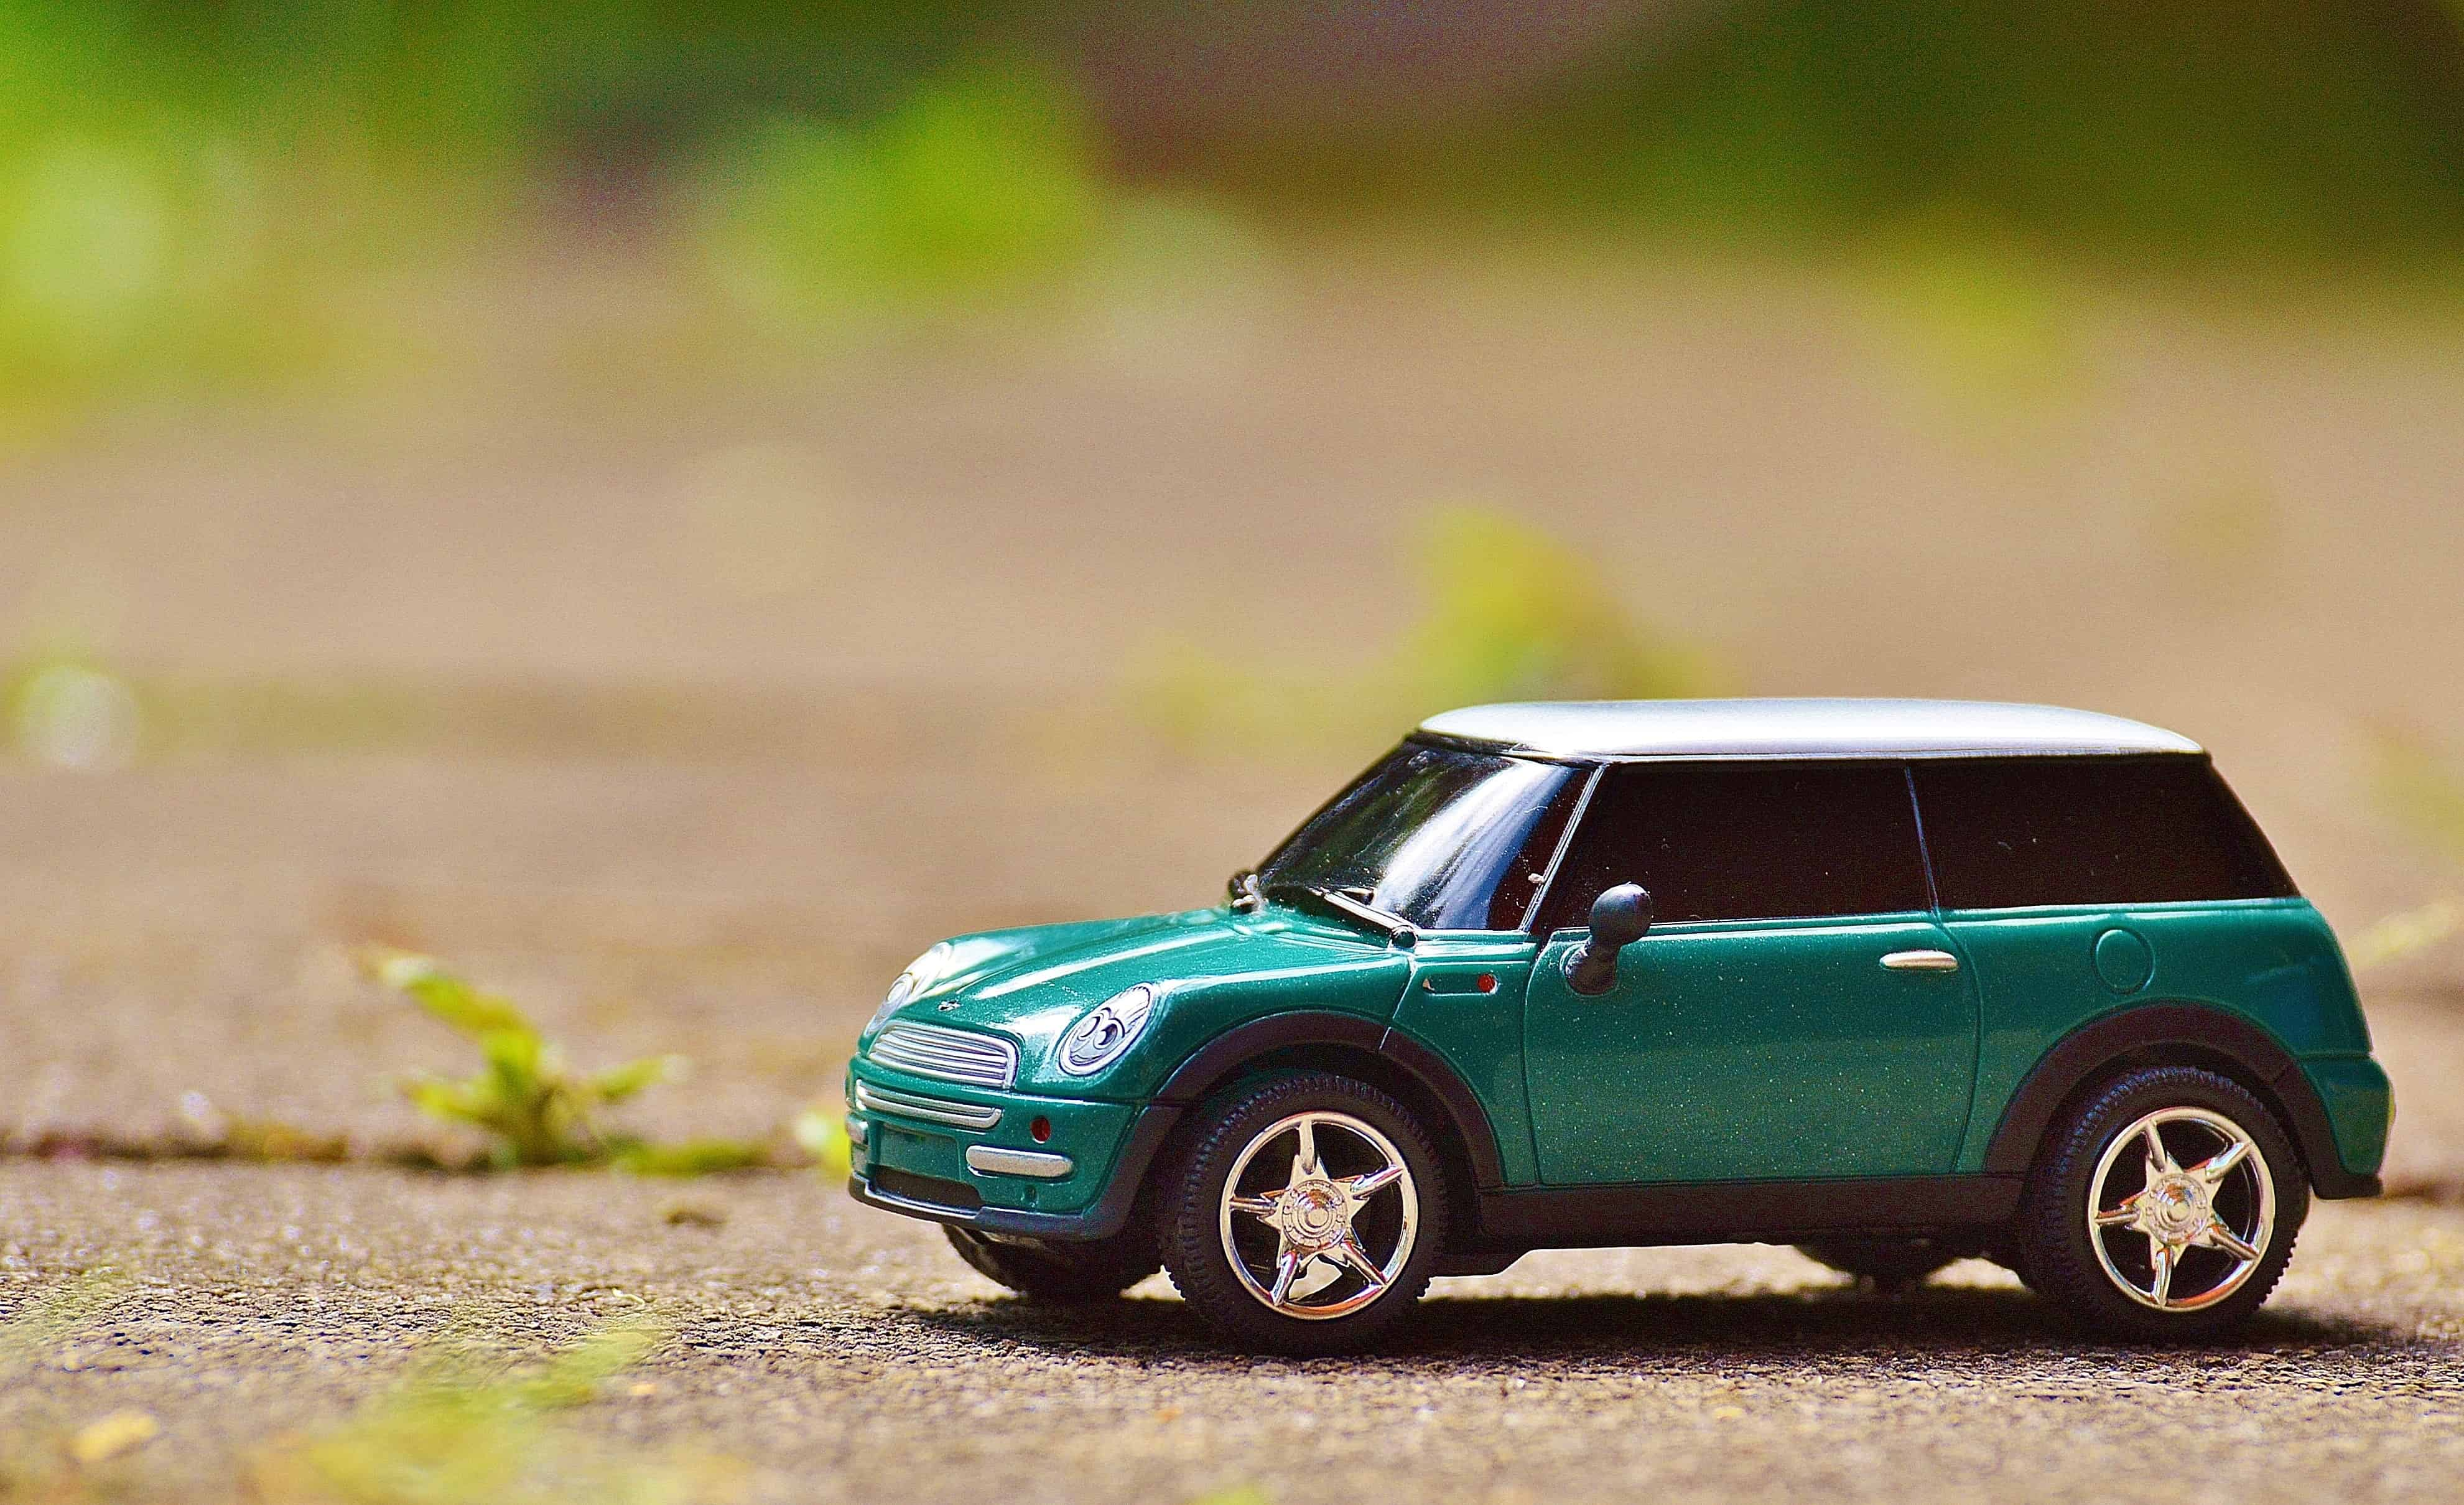 Mini Cooper Car >> Car Macro Mini Cooper 35967 Edustustili Yhtiot